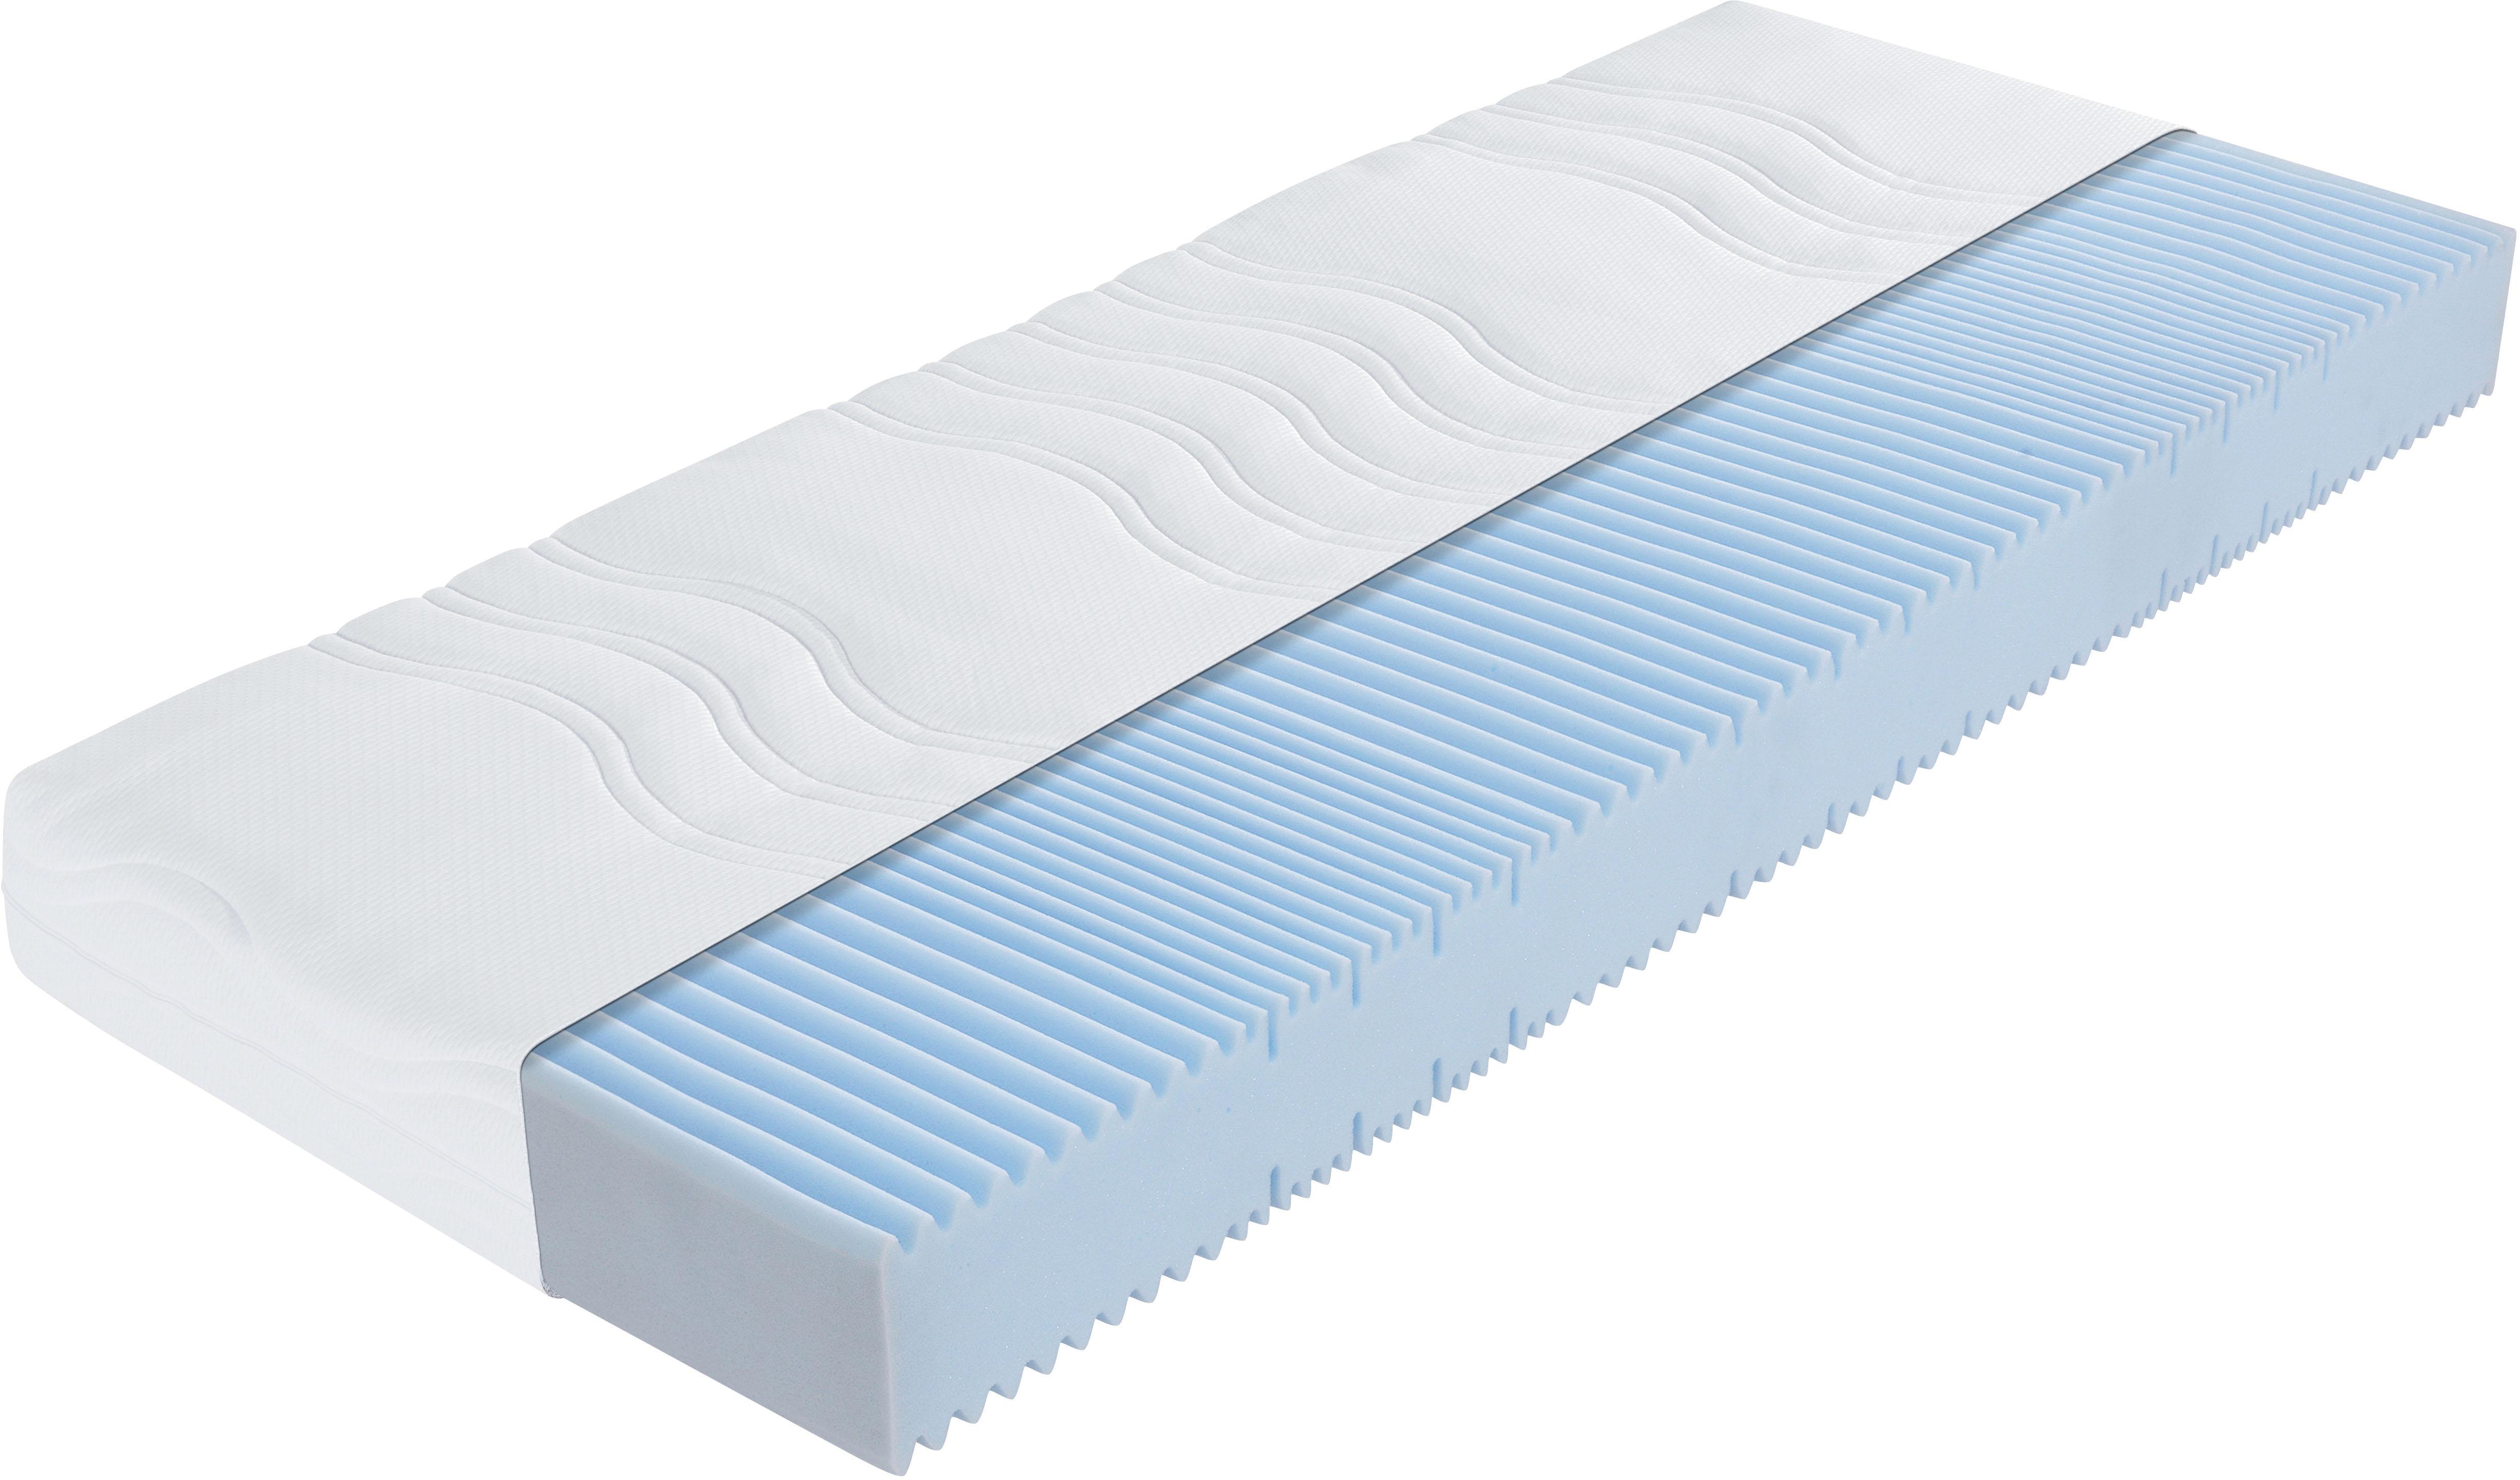 Kaltschaummatratze Matratze Kimberly ADA trendline 18 cm hoch